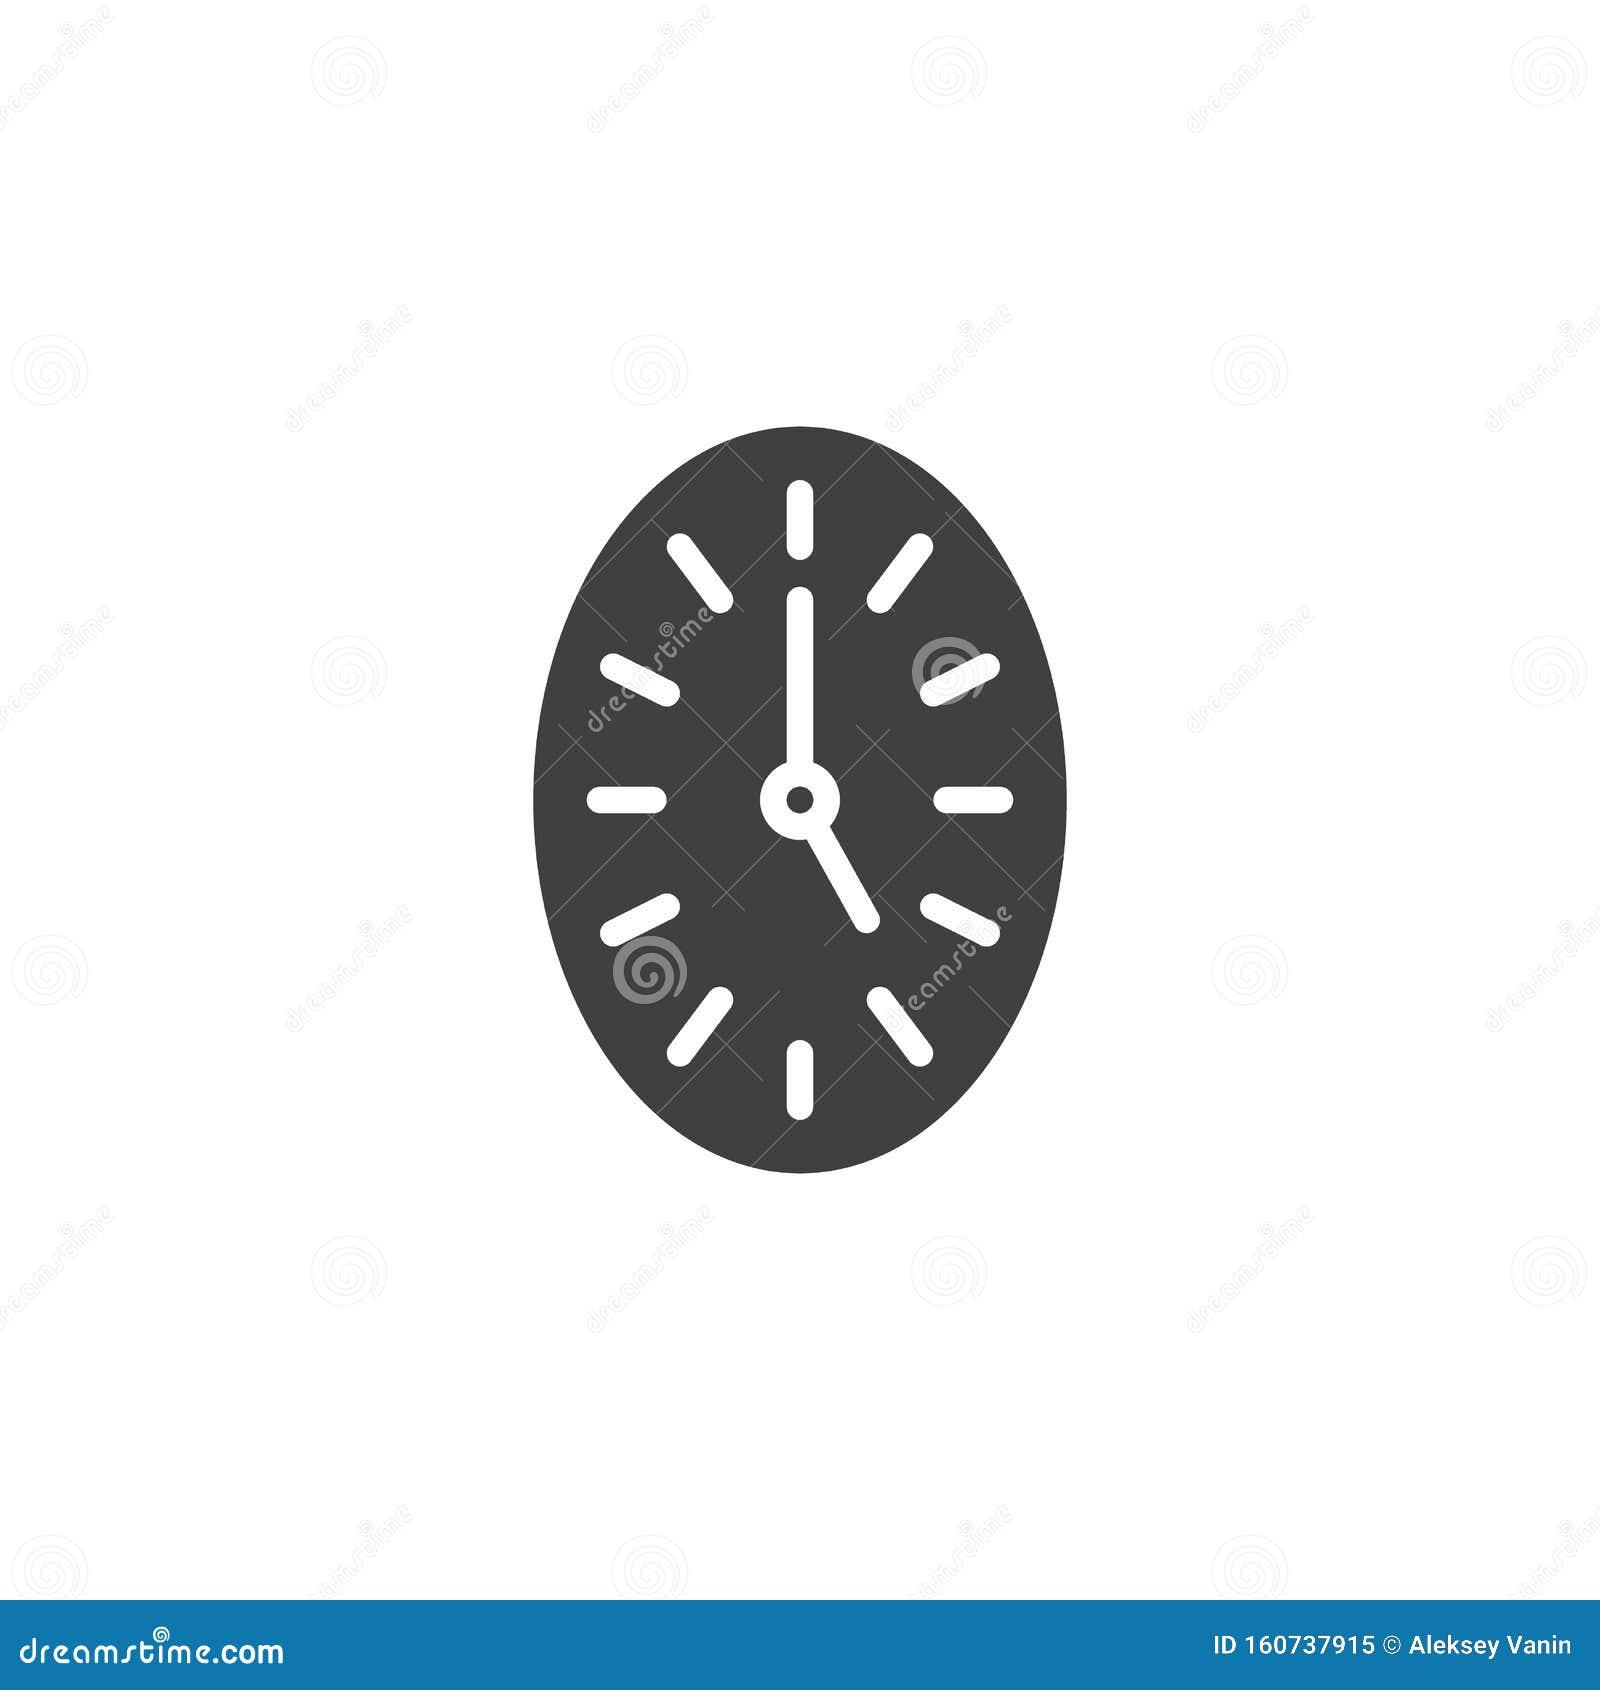 Oval clock vector icon